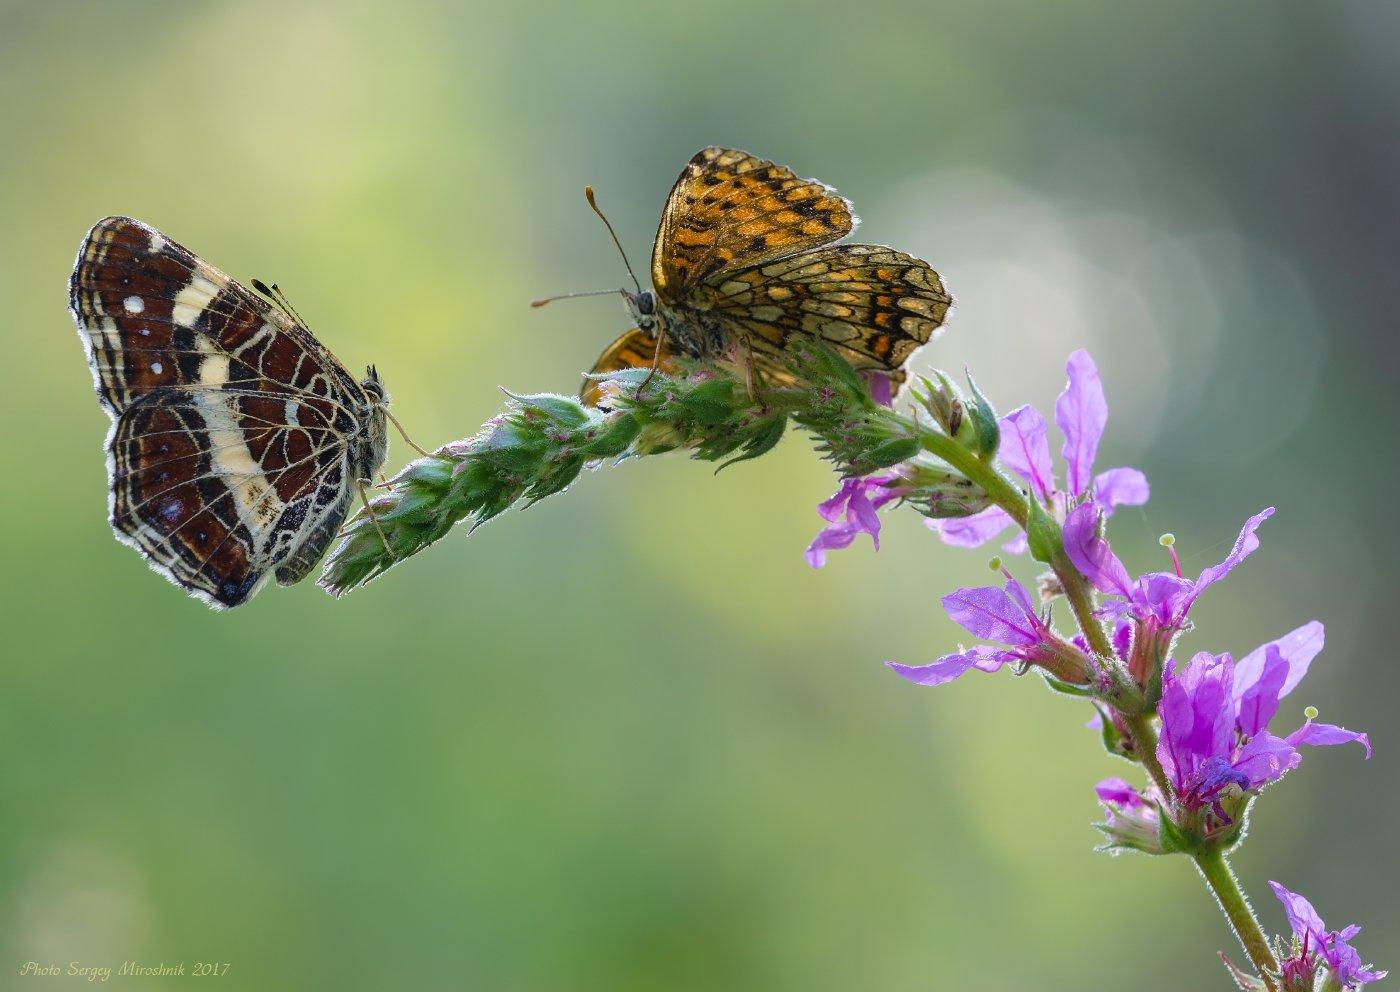 бабочка, природа, макро, лето, красиво, украина, крылья, цветок, Сергій Мірошник